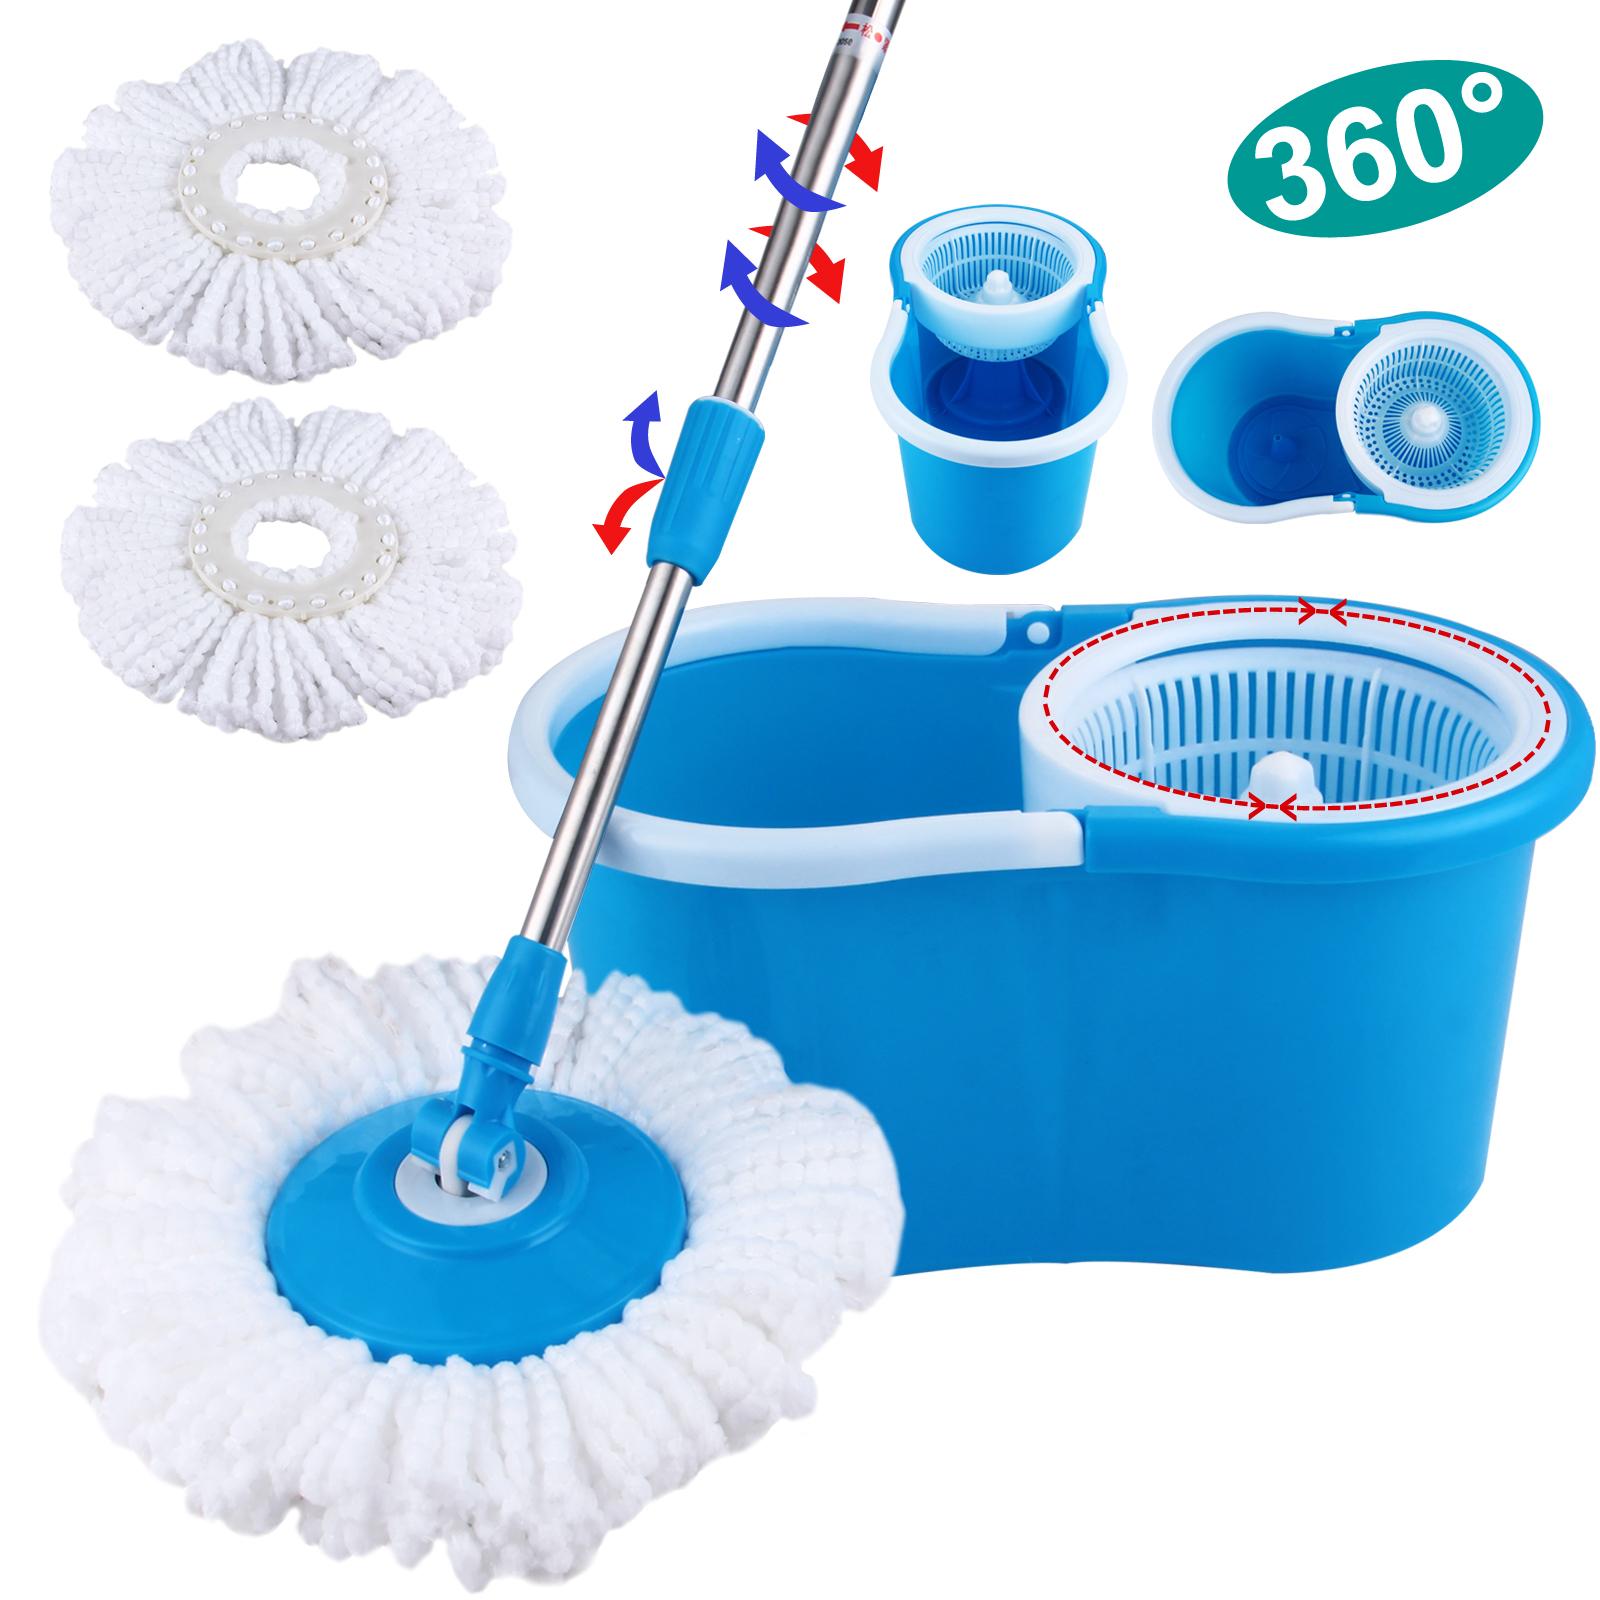 Microfiber 2 Heads 360 176 Spinning Floor Mop Magic Spin Easy